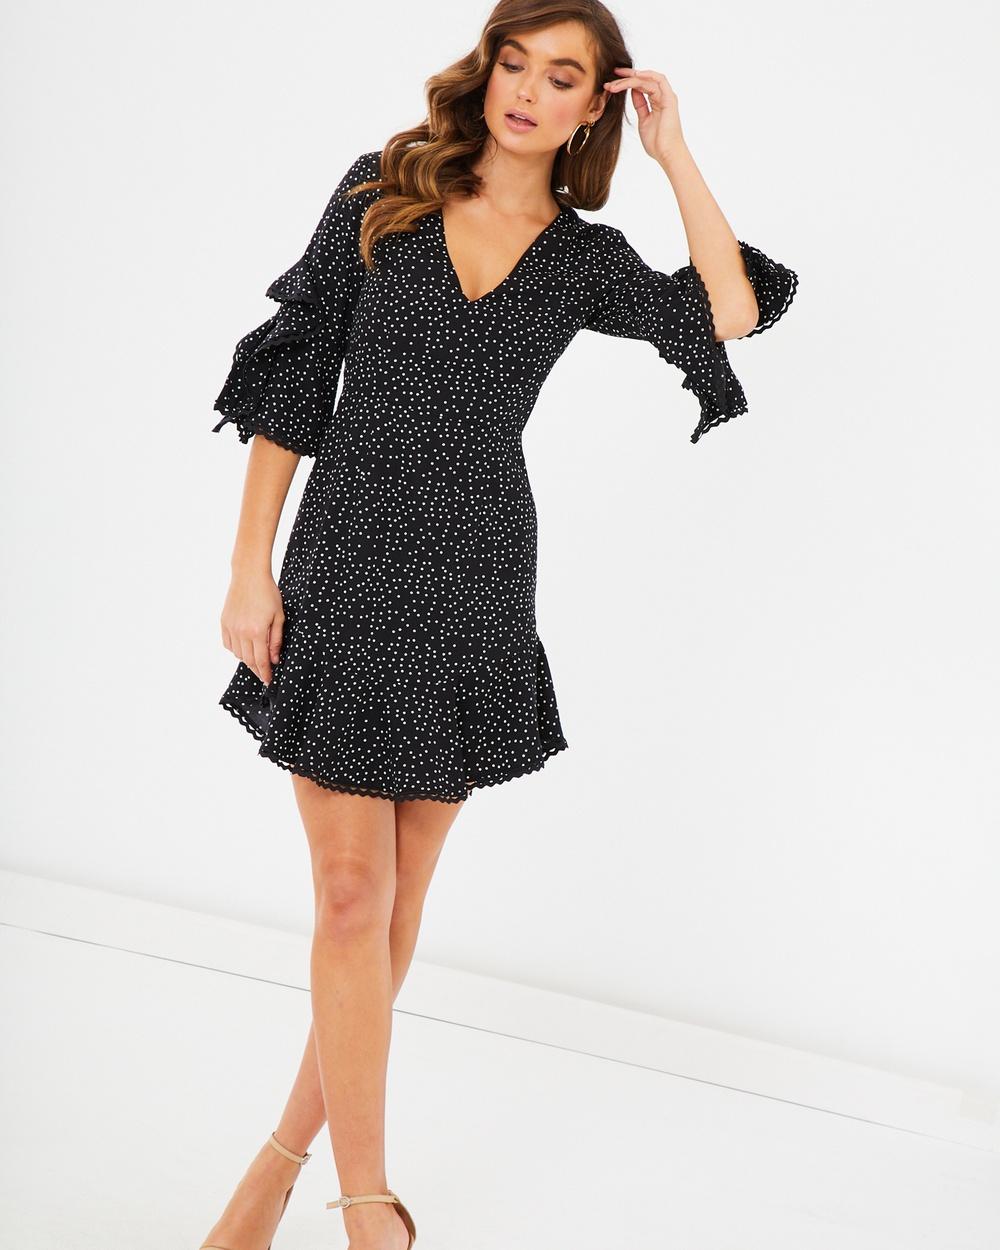 Photo of Tussah Black Spot Perla Dress - beautiful dress from Tussah online